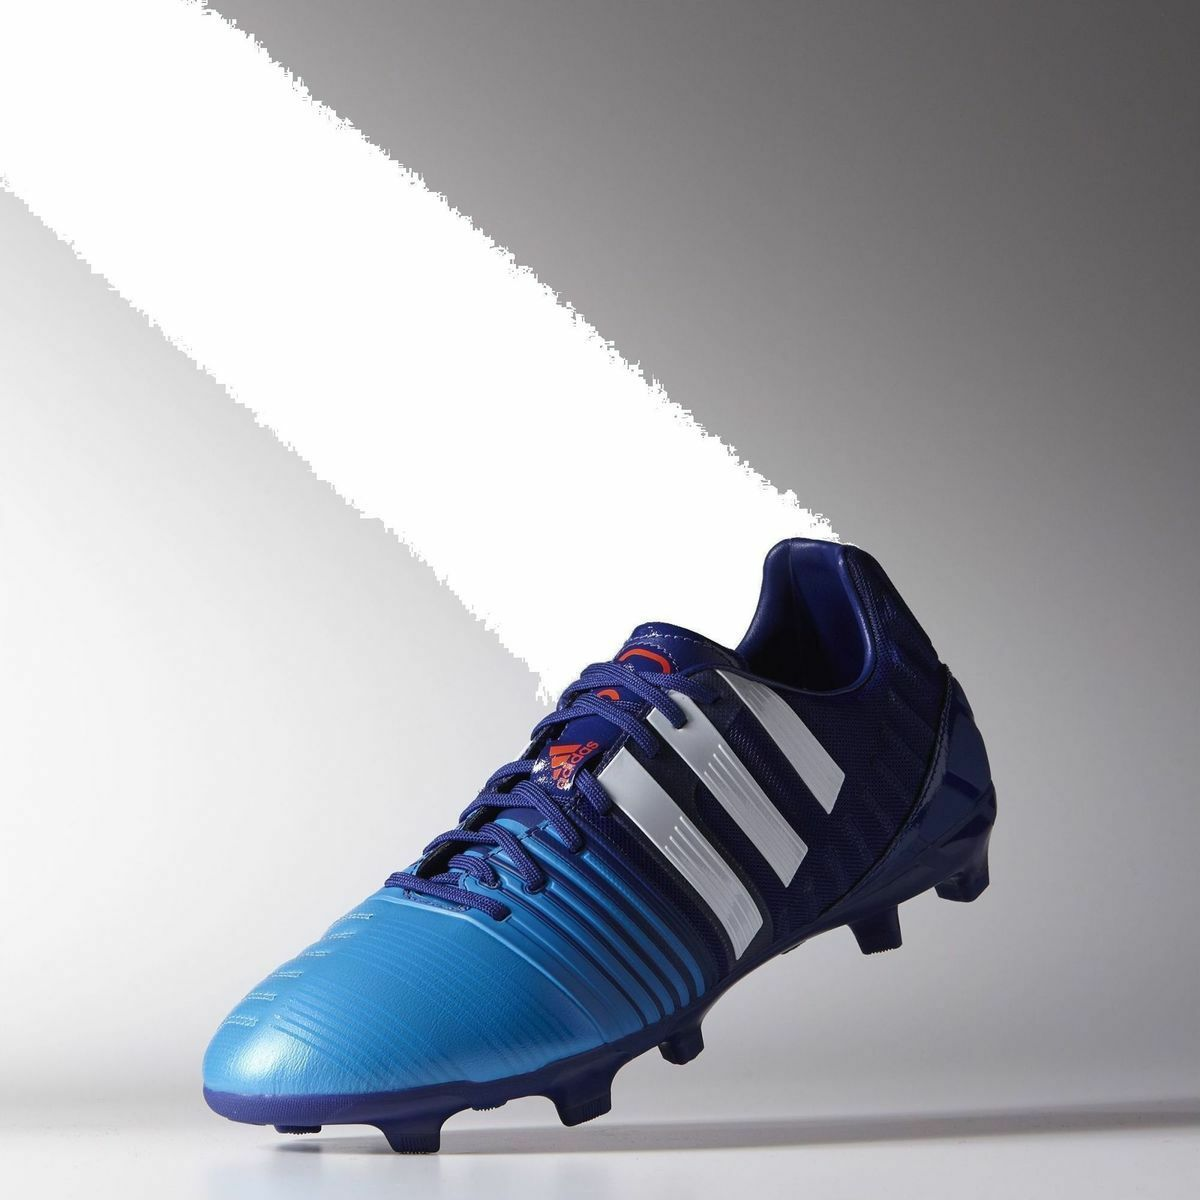 Adidas Nitrocharge 2.0 FG  Mens Soccer Football Boots Boots Football  -B40333 9571a6